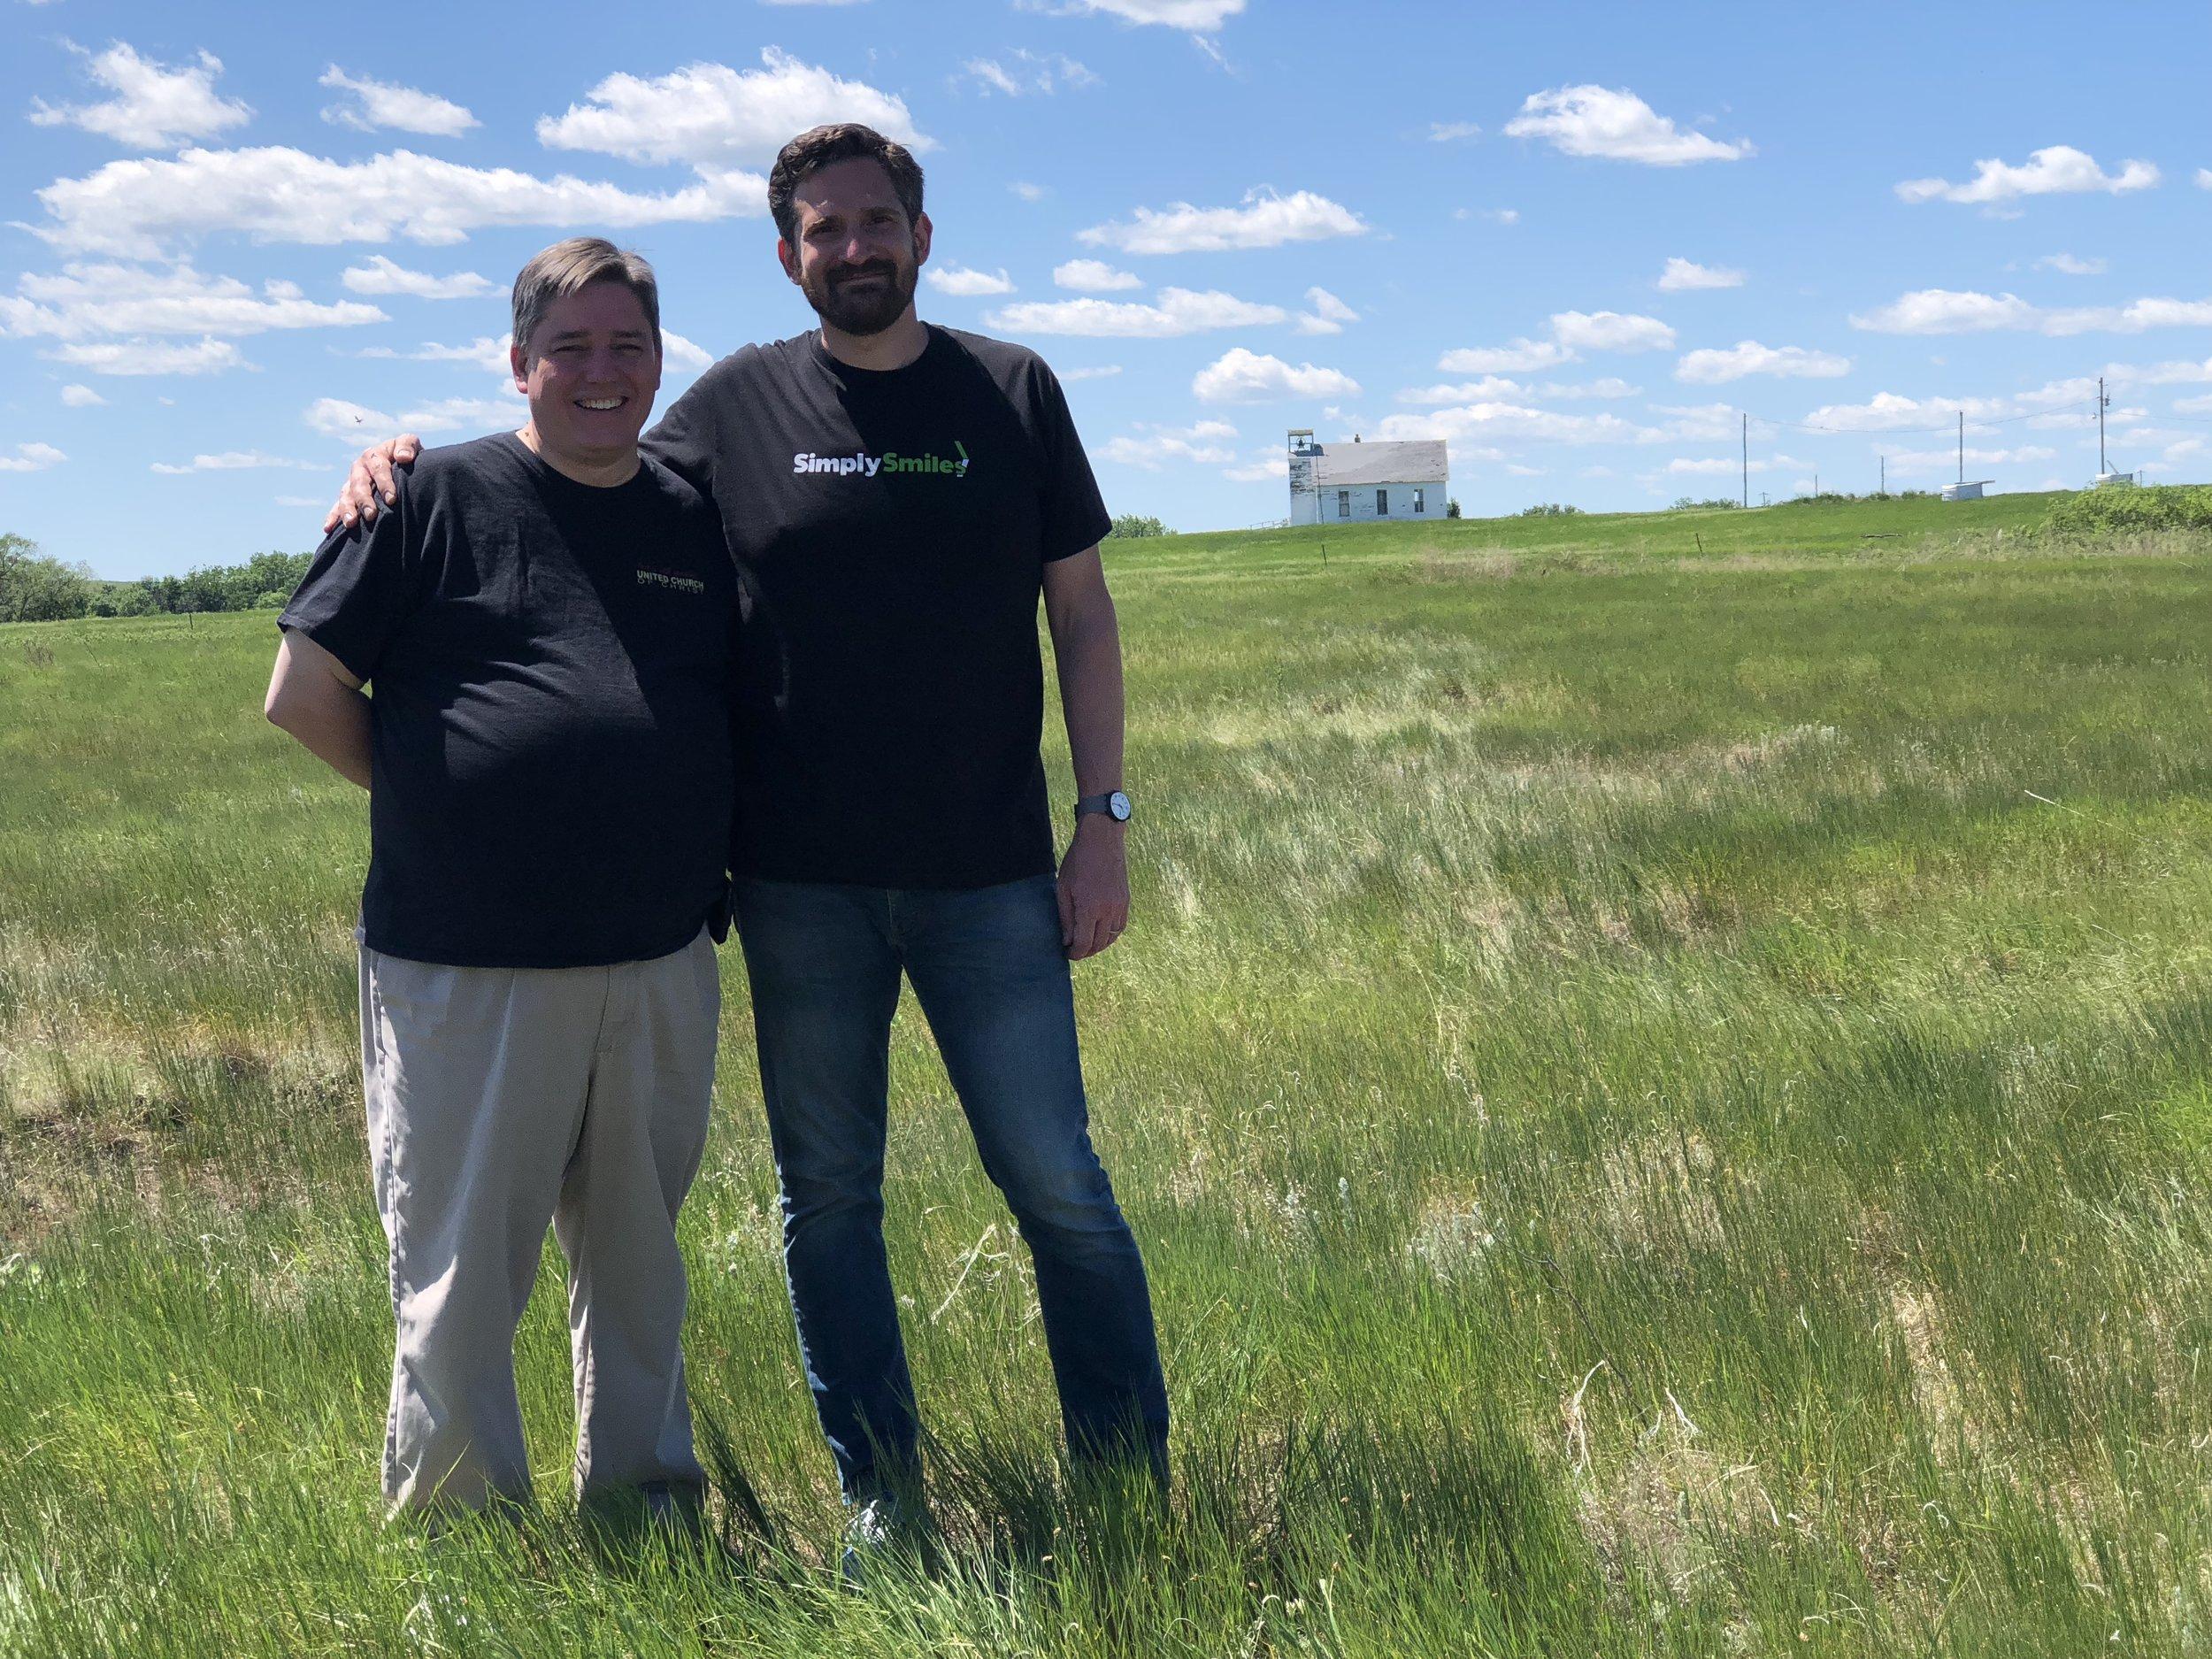 Rev. Gordon Rankin (left) with Bryan Nurnberger stand on the leased Dakota Association land in La Plant, South Dakota on the Cheyenne River Reservation.